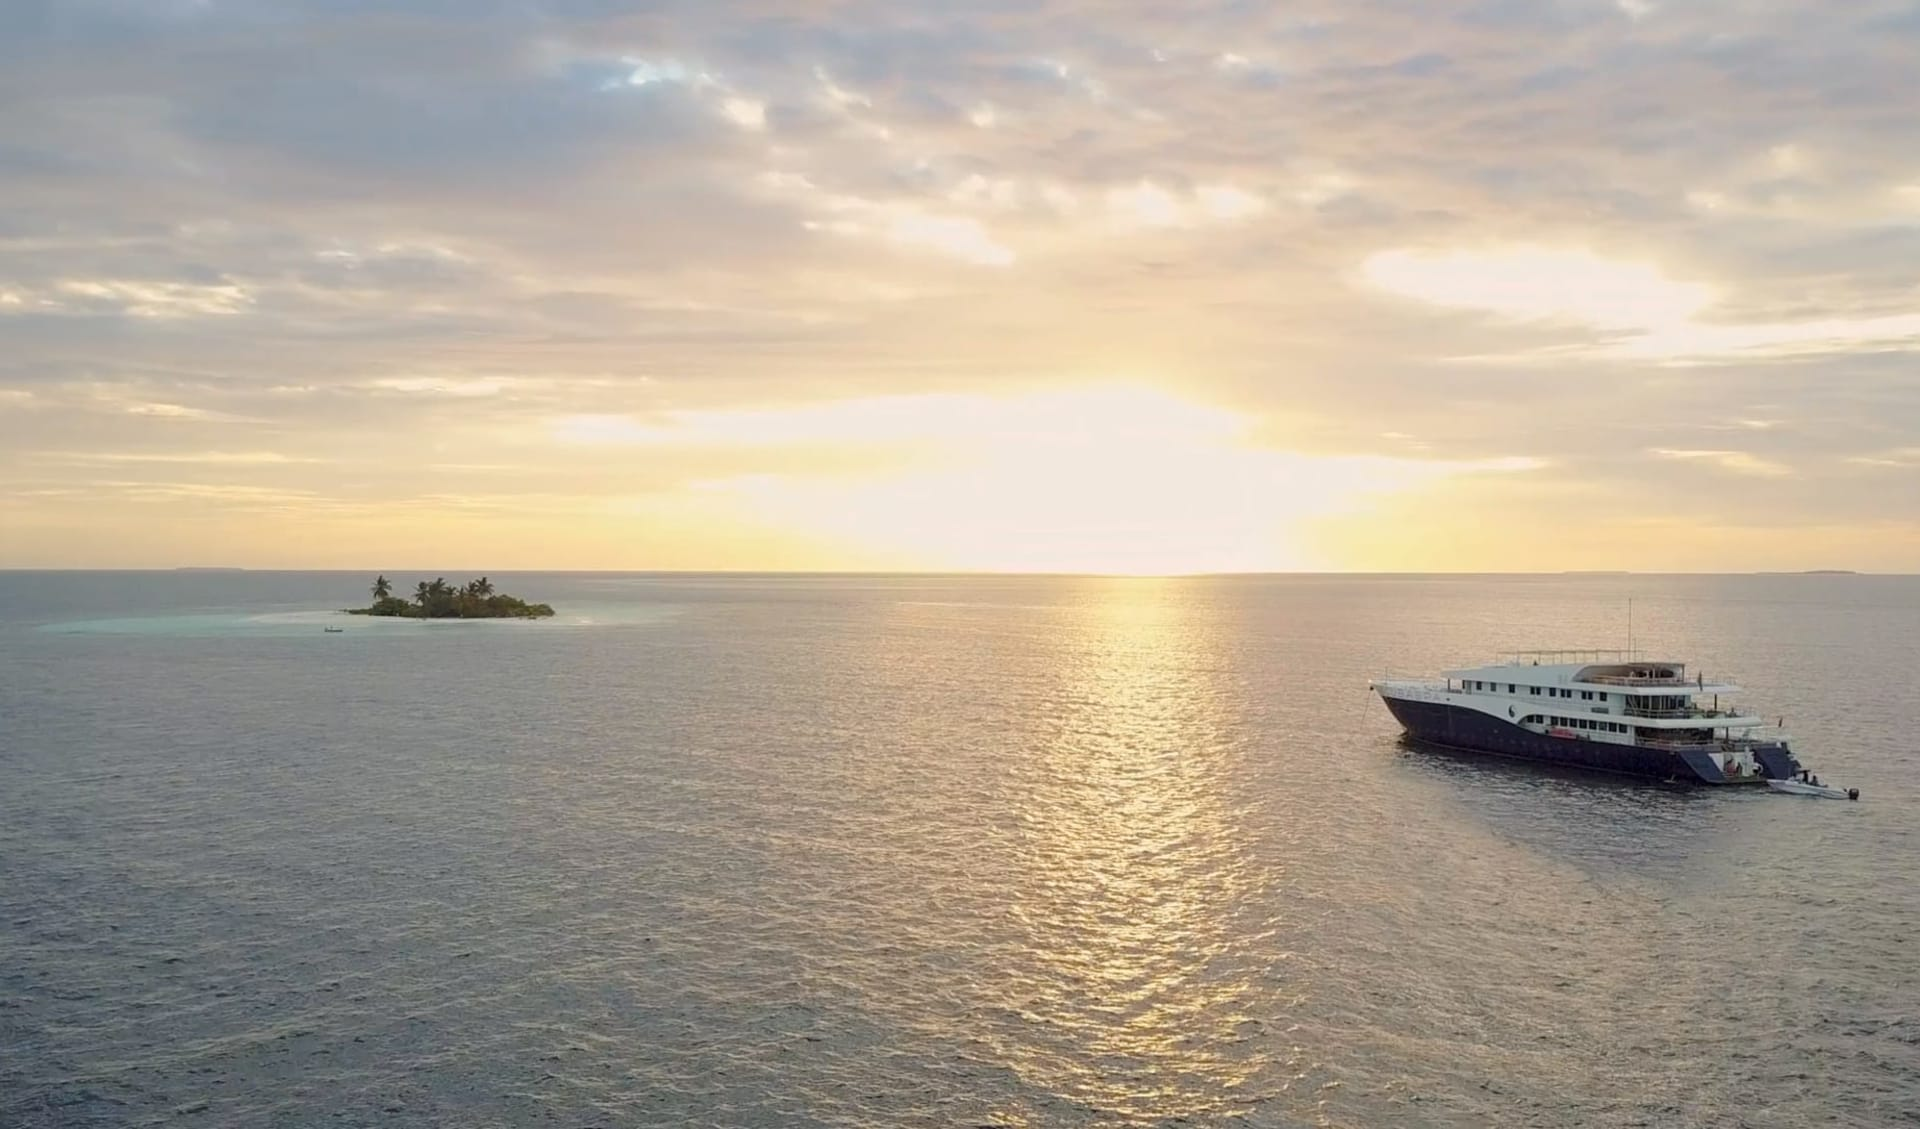 The Floating Resort by Scubaspa ab Malé: Scubaspa Ying & Scubaspa Yang